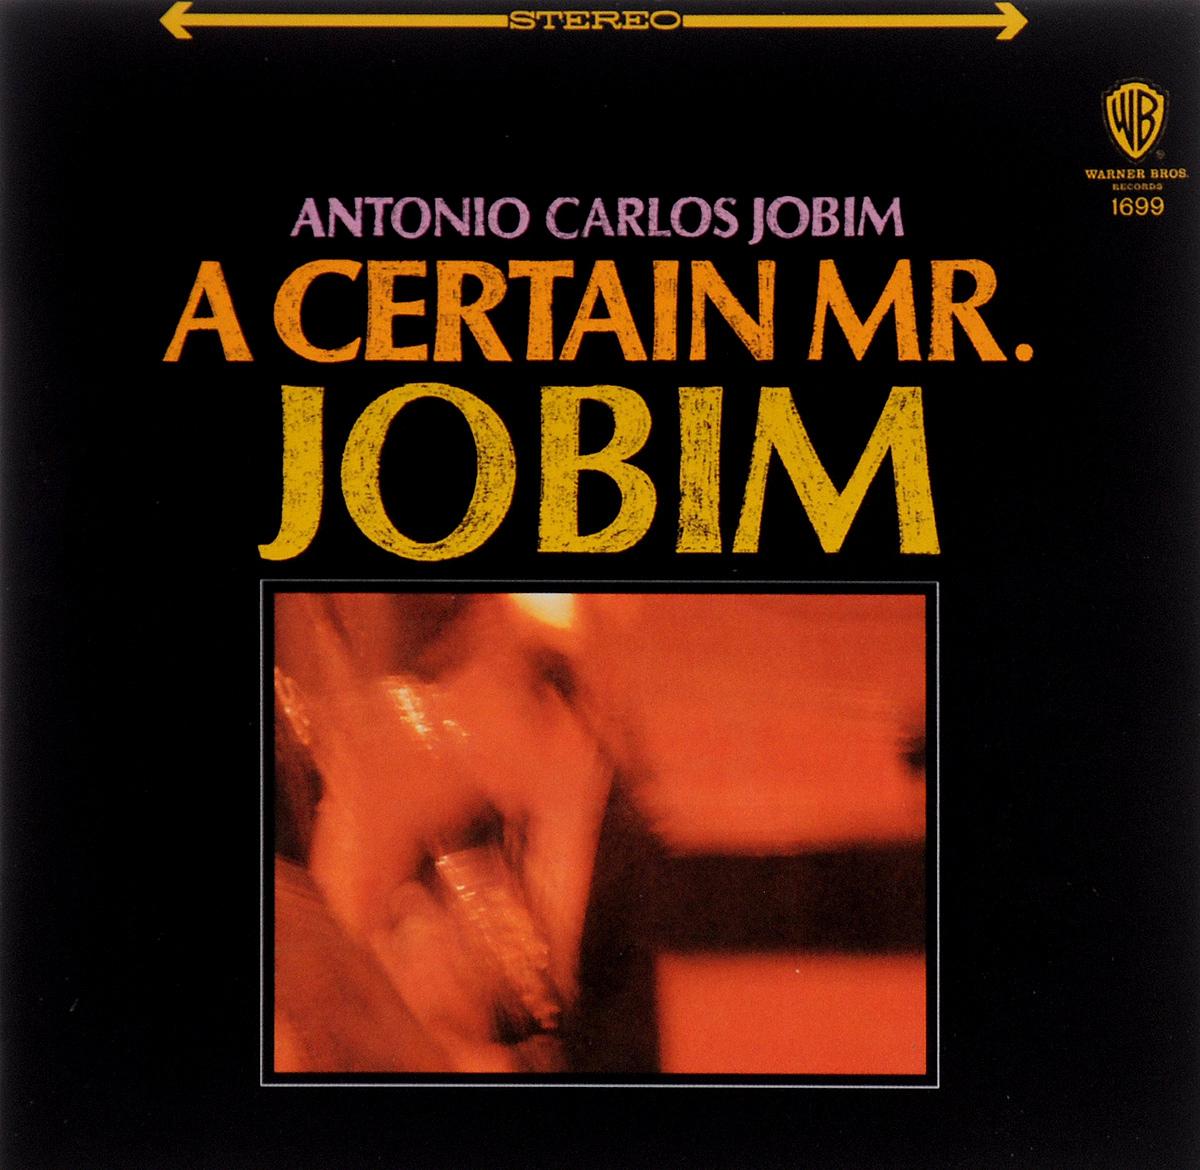 лучшая цена Антонио Карлос Жобим Antonio Carlos Jobim. A Certain Mr. Jobim